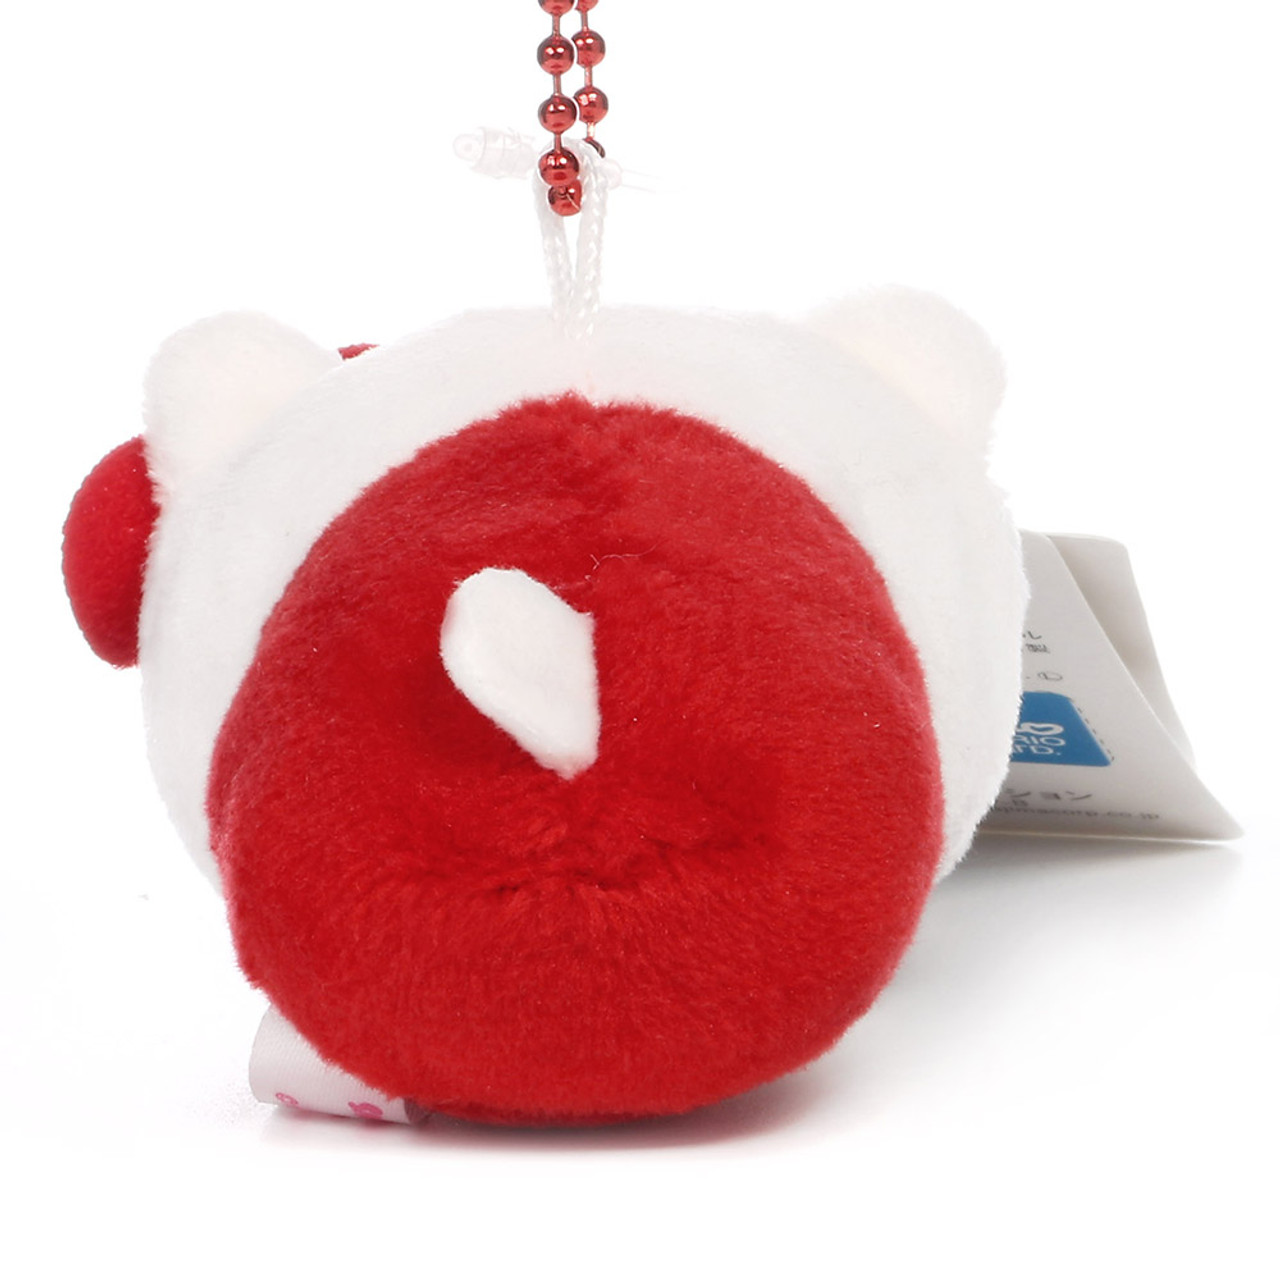 Sanrio x Monimals Hello Kitty Cute Animal Mascot Plush Keychain ( Back View )